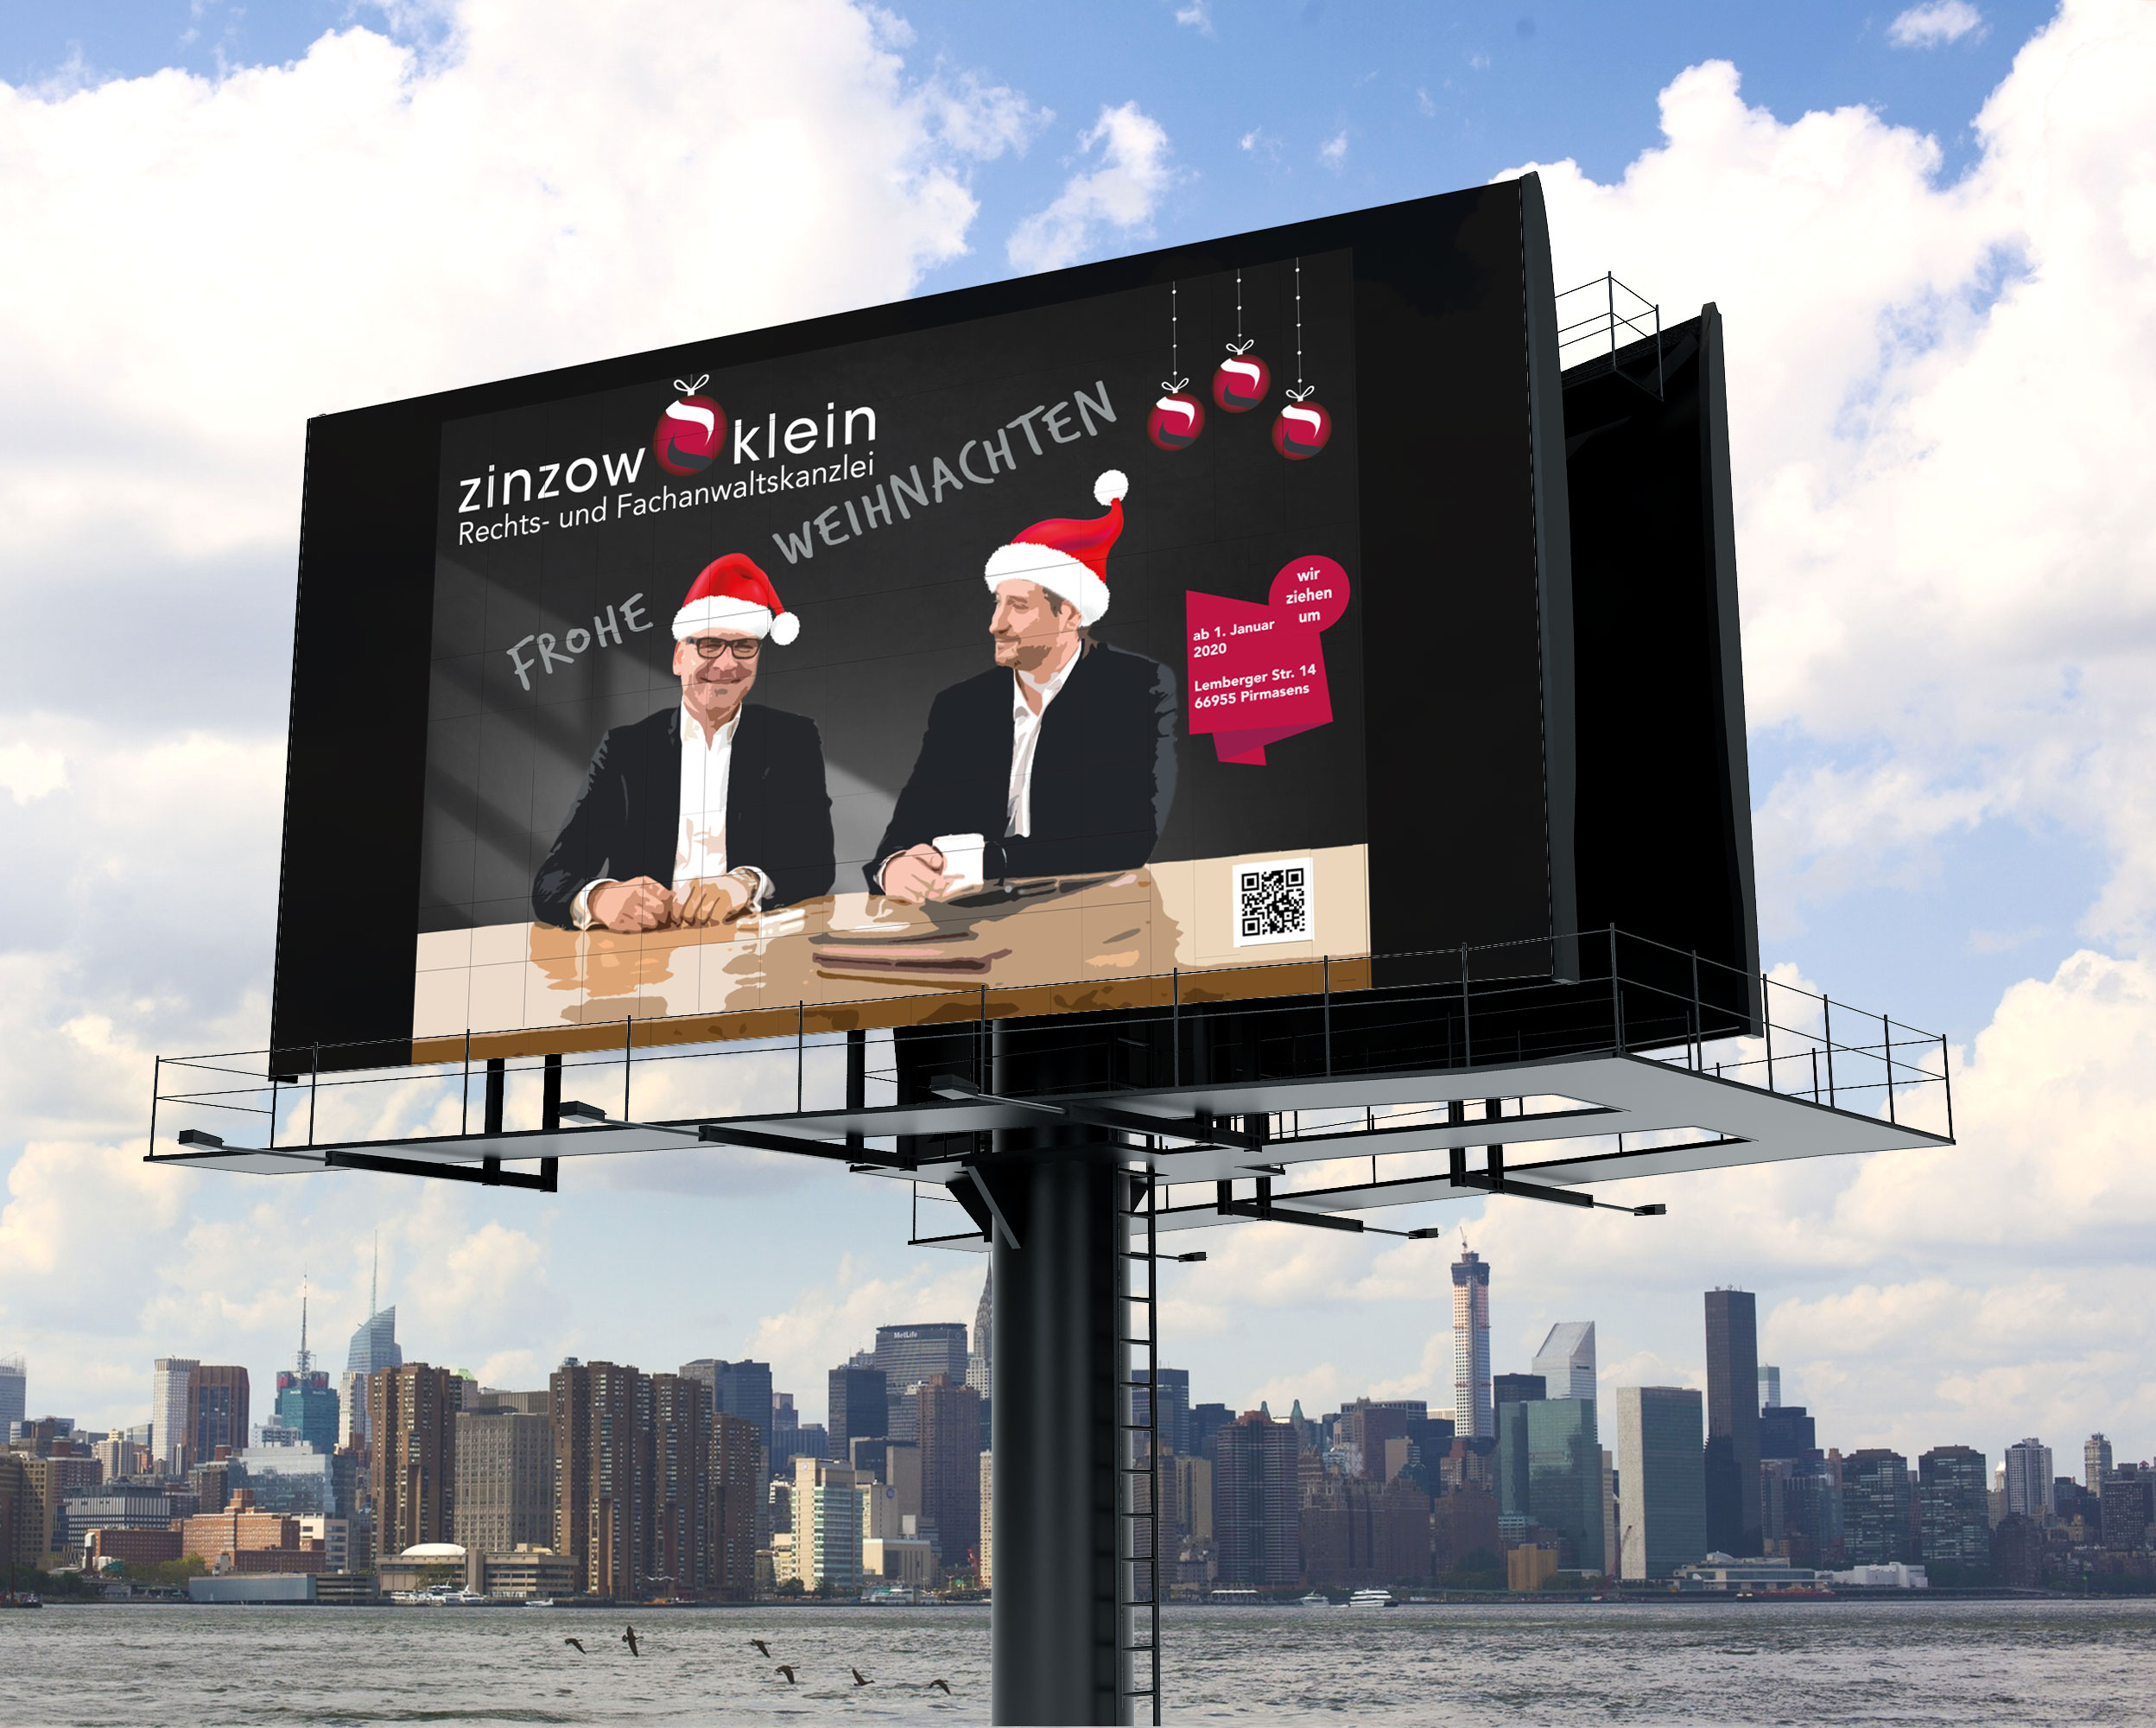 Weihnachtsplakat Rechtsanwalt